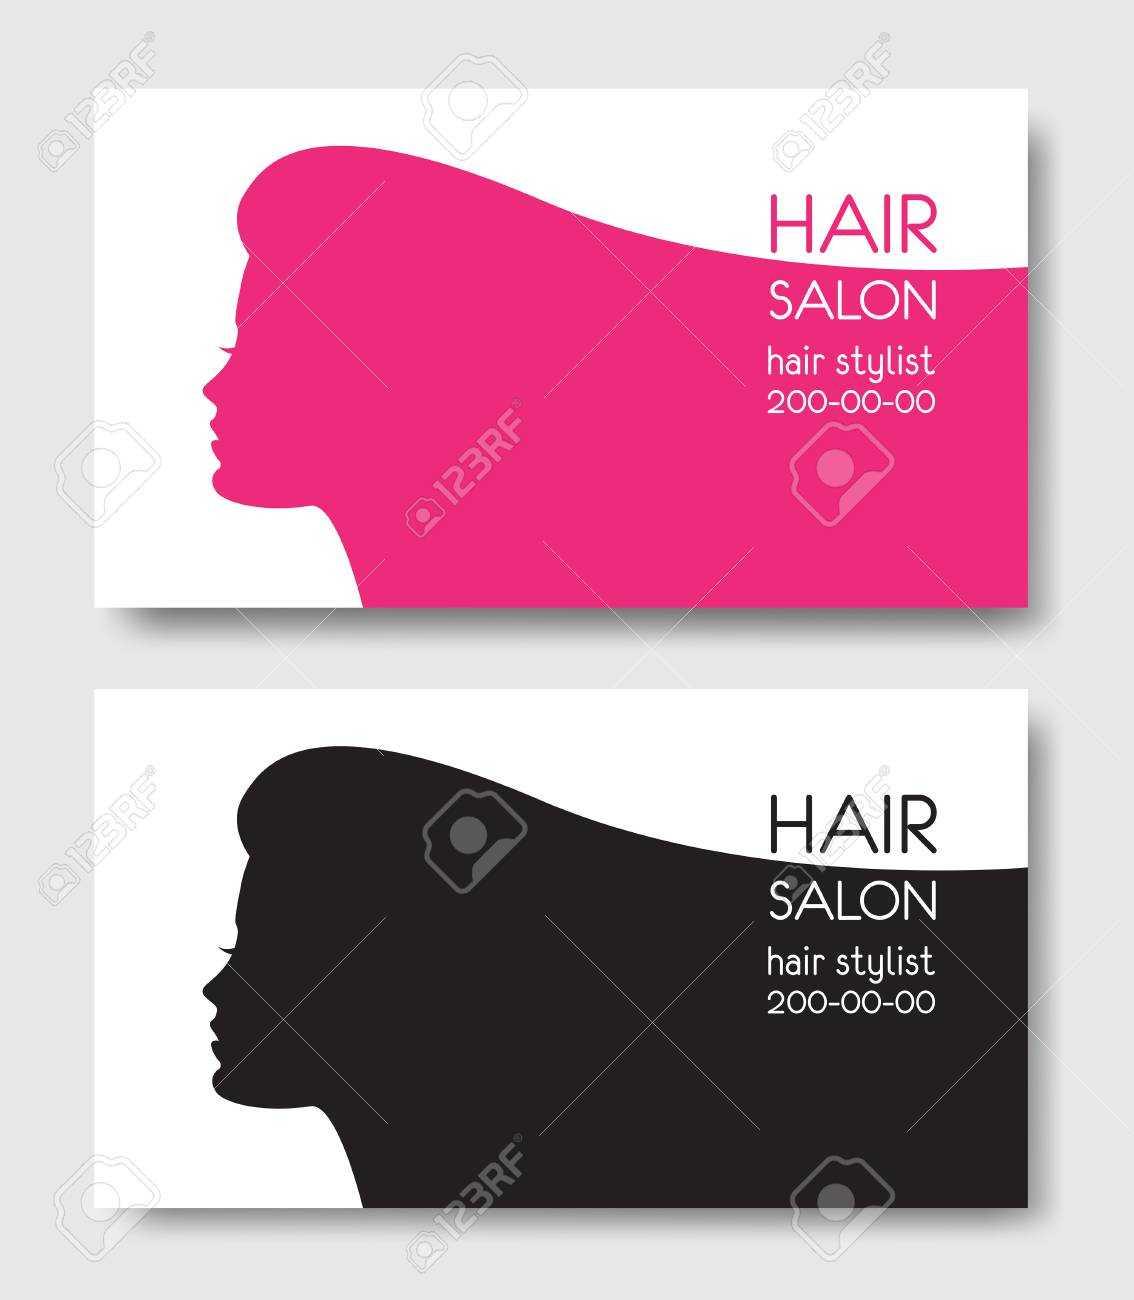 Hair Salon Business Card Templates With Beautiful Woman Face Sil Within Hair Salon Business Card Template